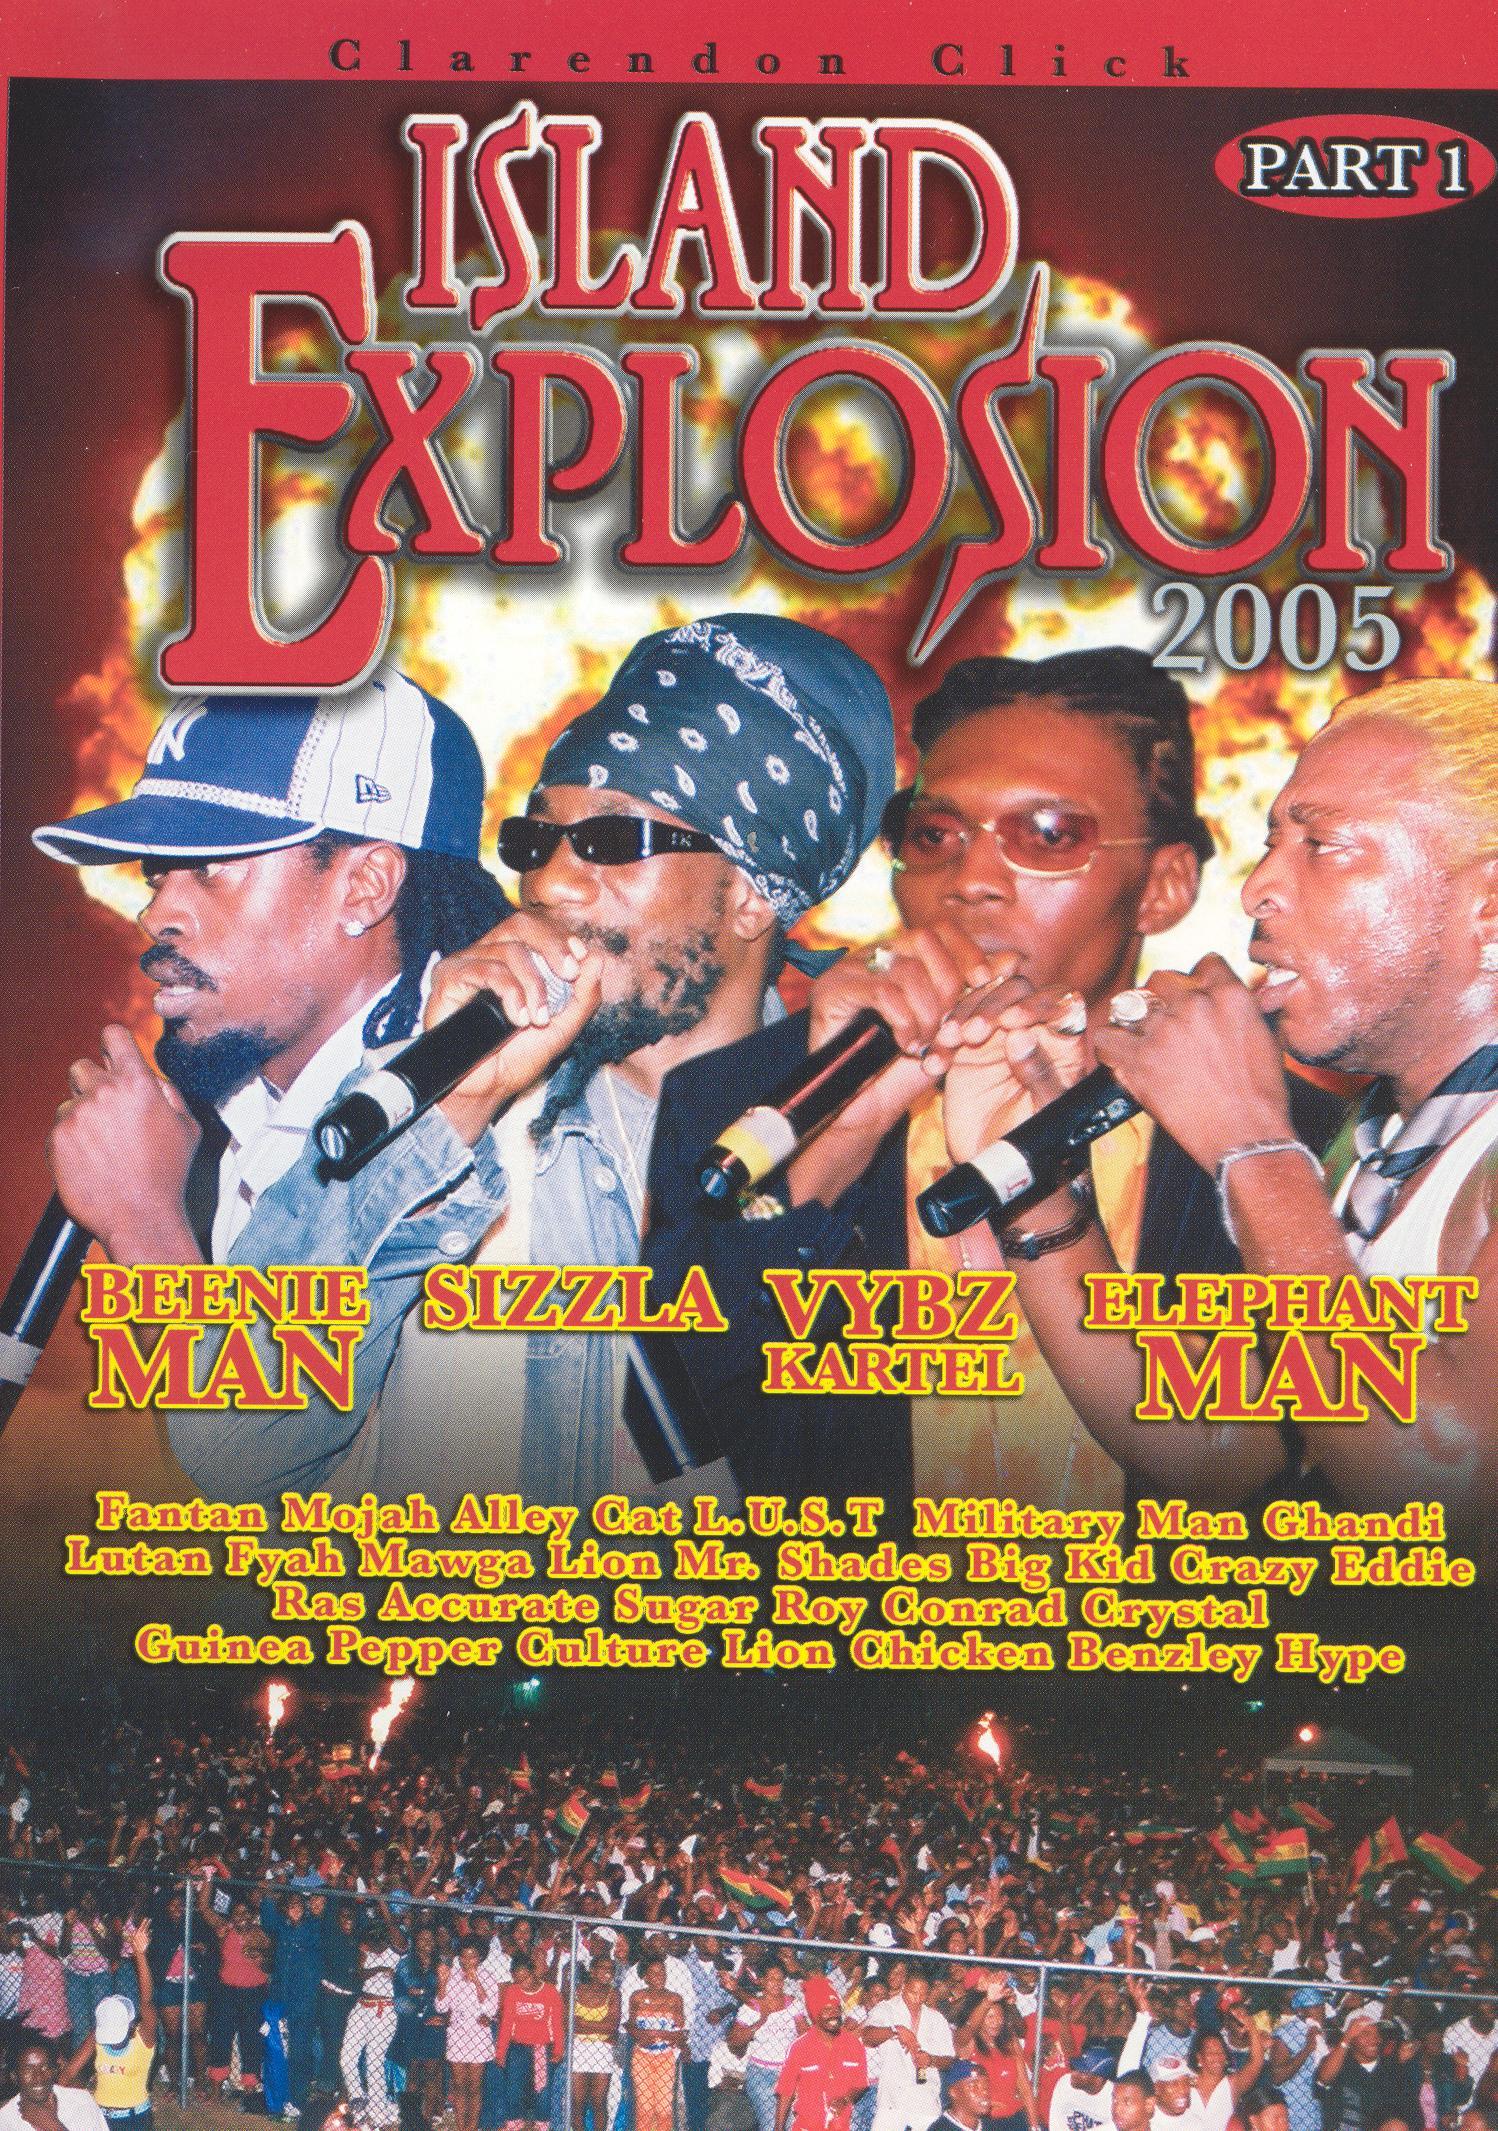 Island Explosion 2005, Pt. 1